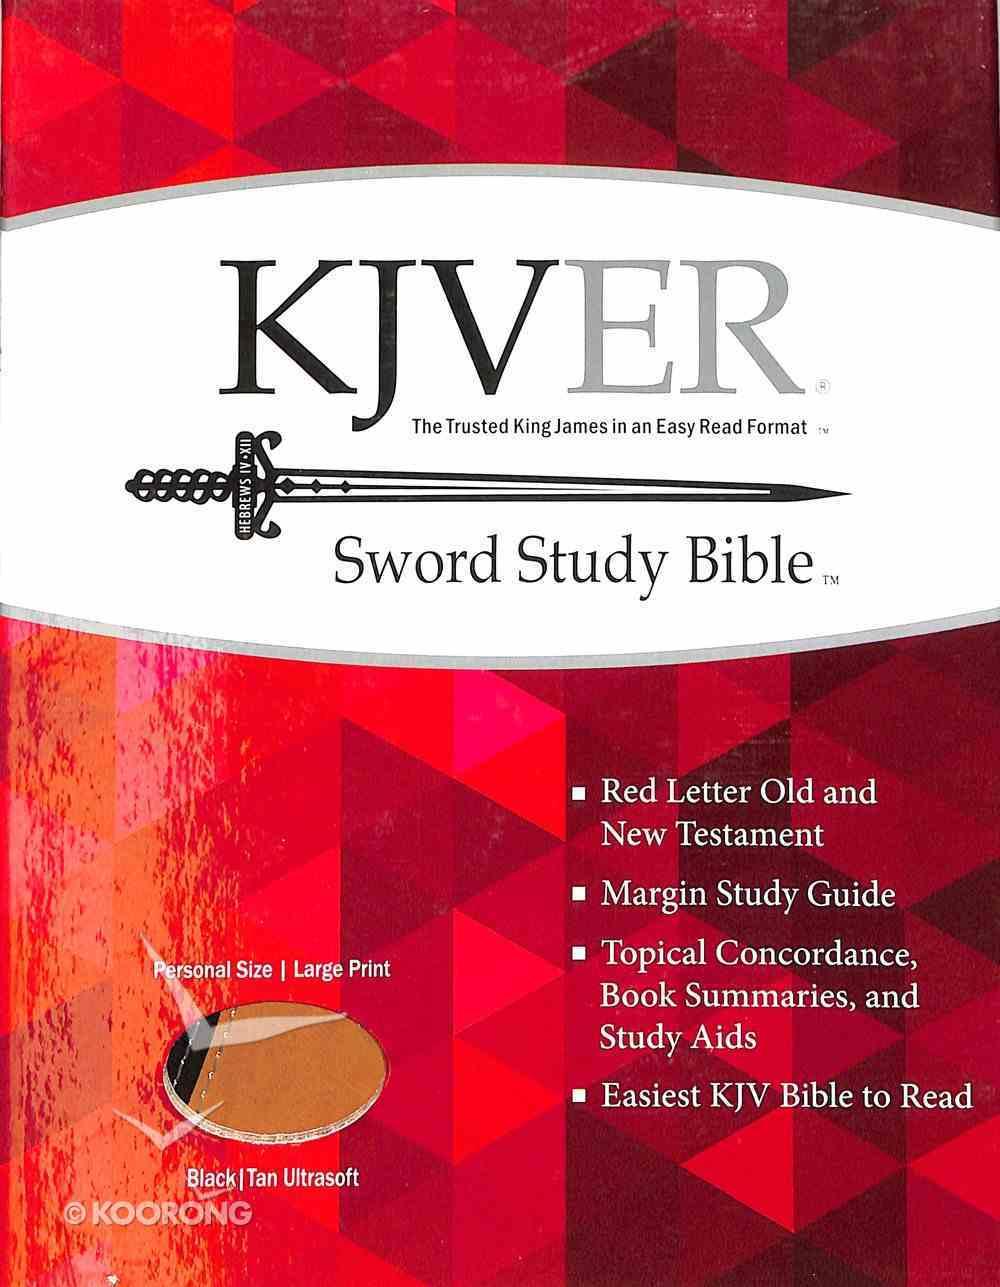 Kjver Sword Study Personal Size Large Print Bible Black/Tan Ultrasoft Imitation Leather